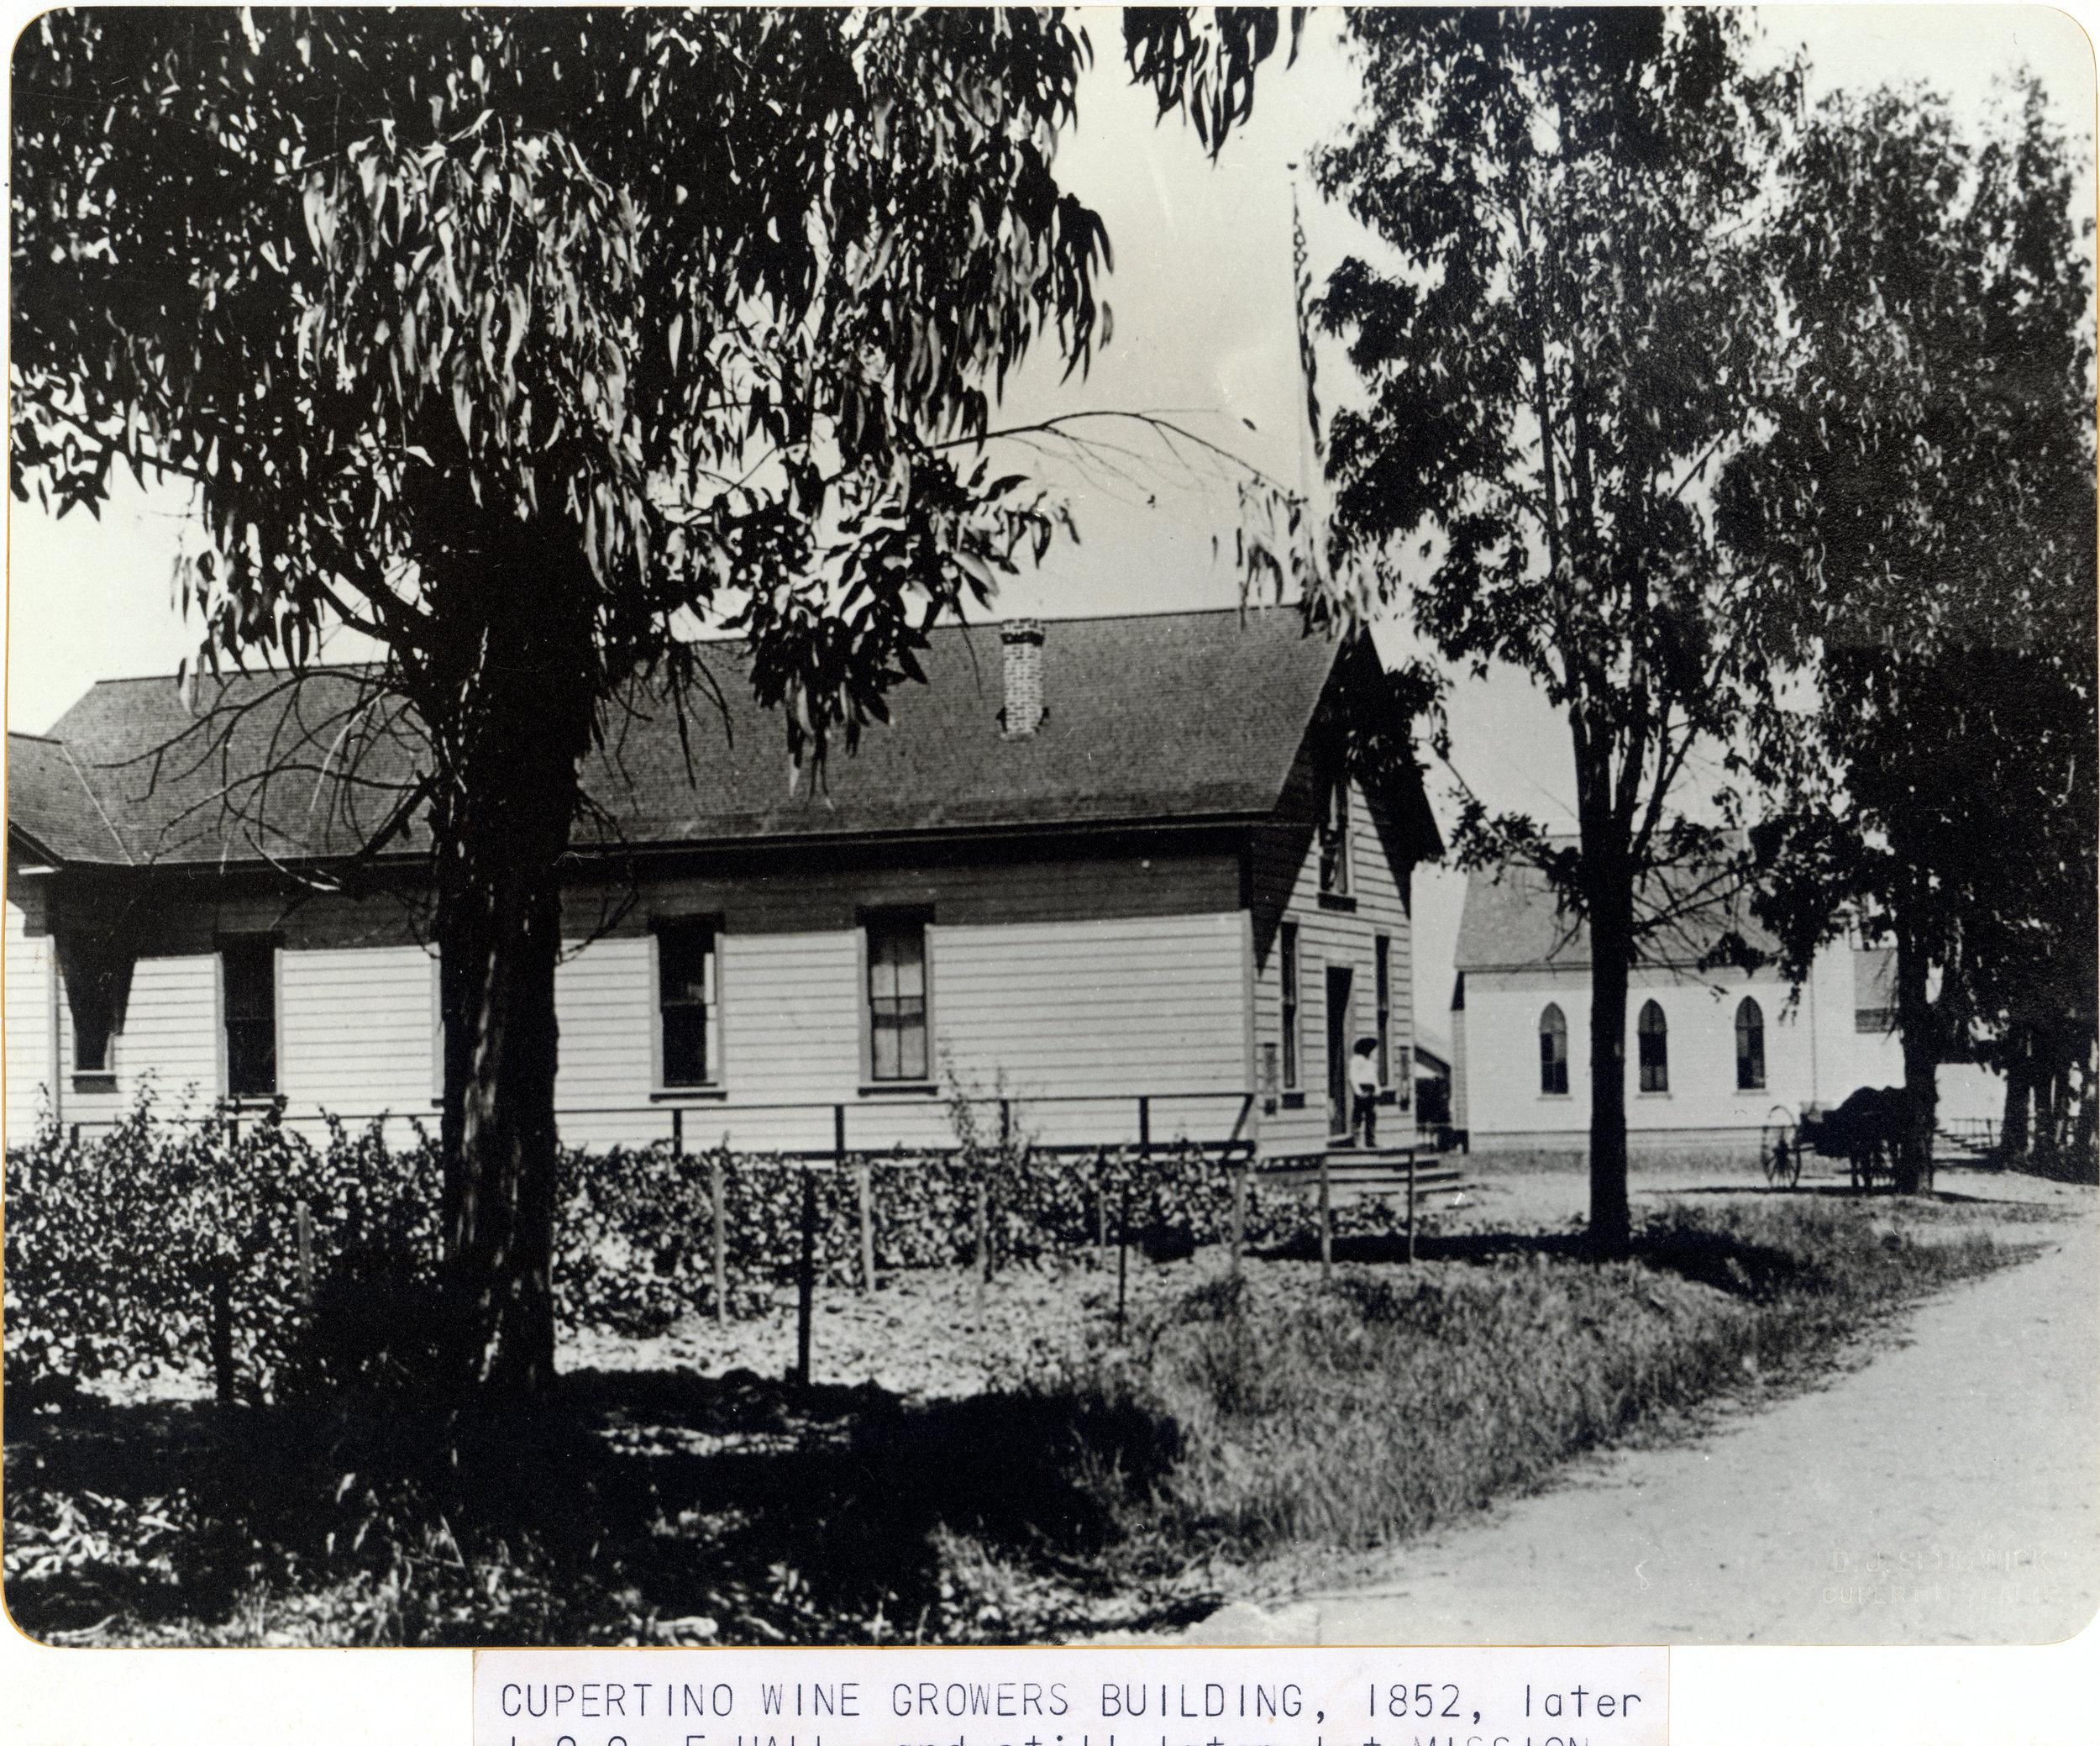 Cupertino-Wine-Growers-Building,-1852.jpg